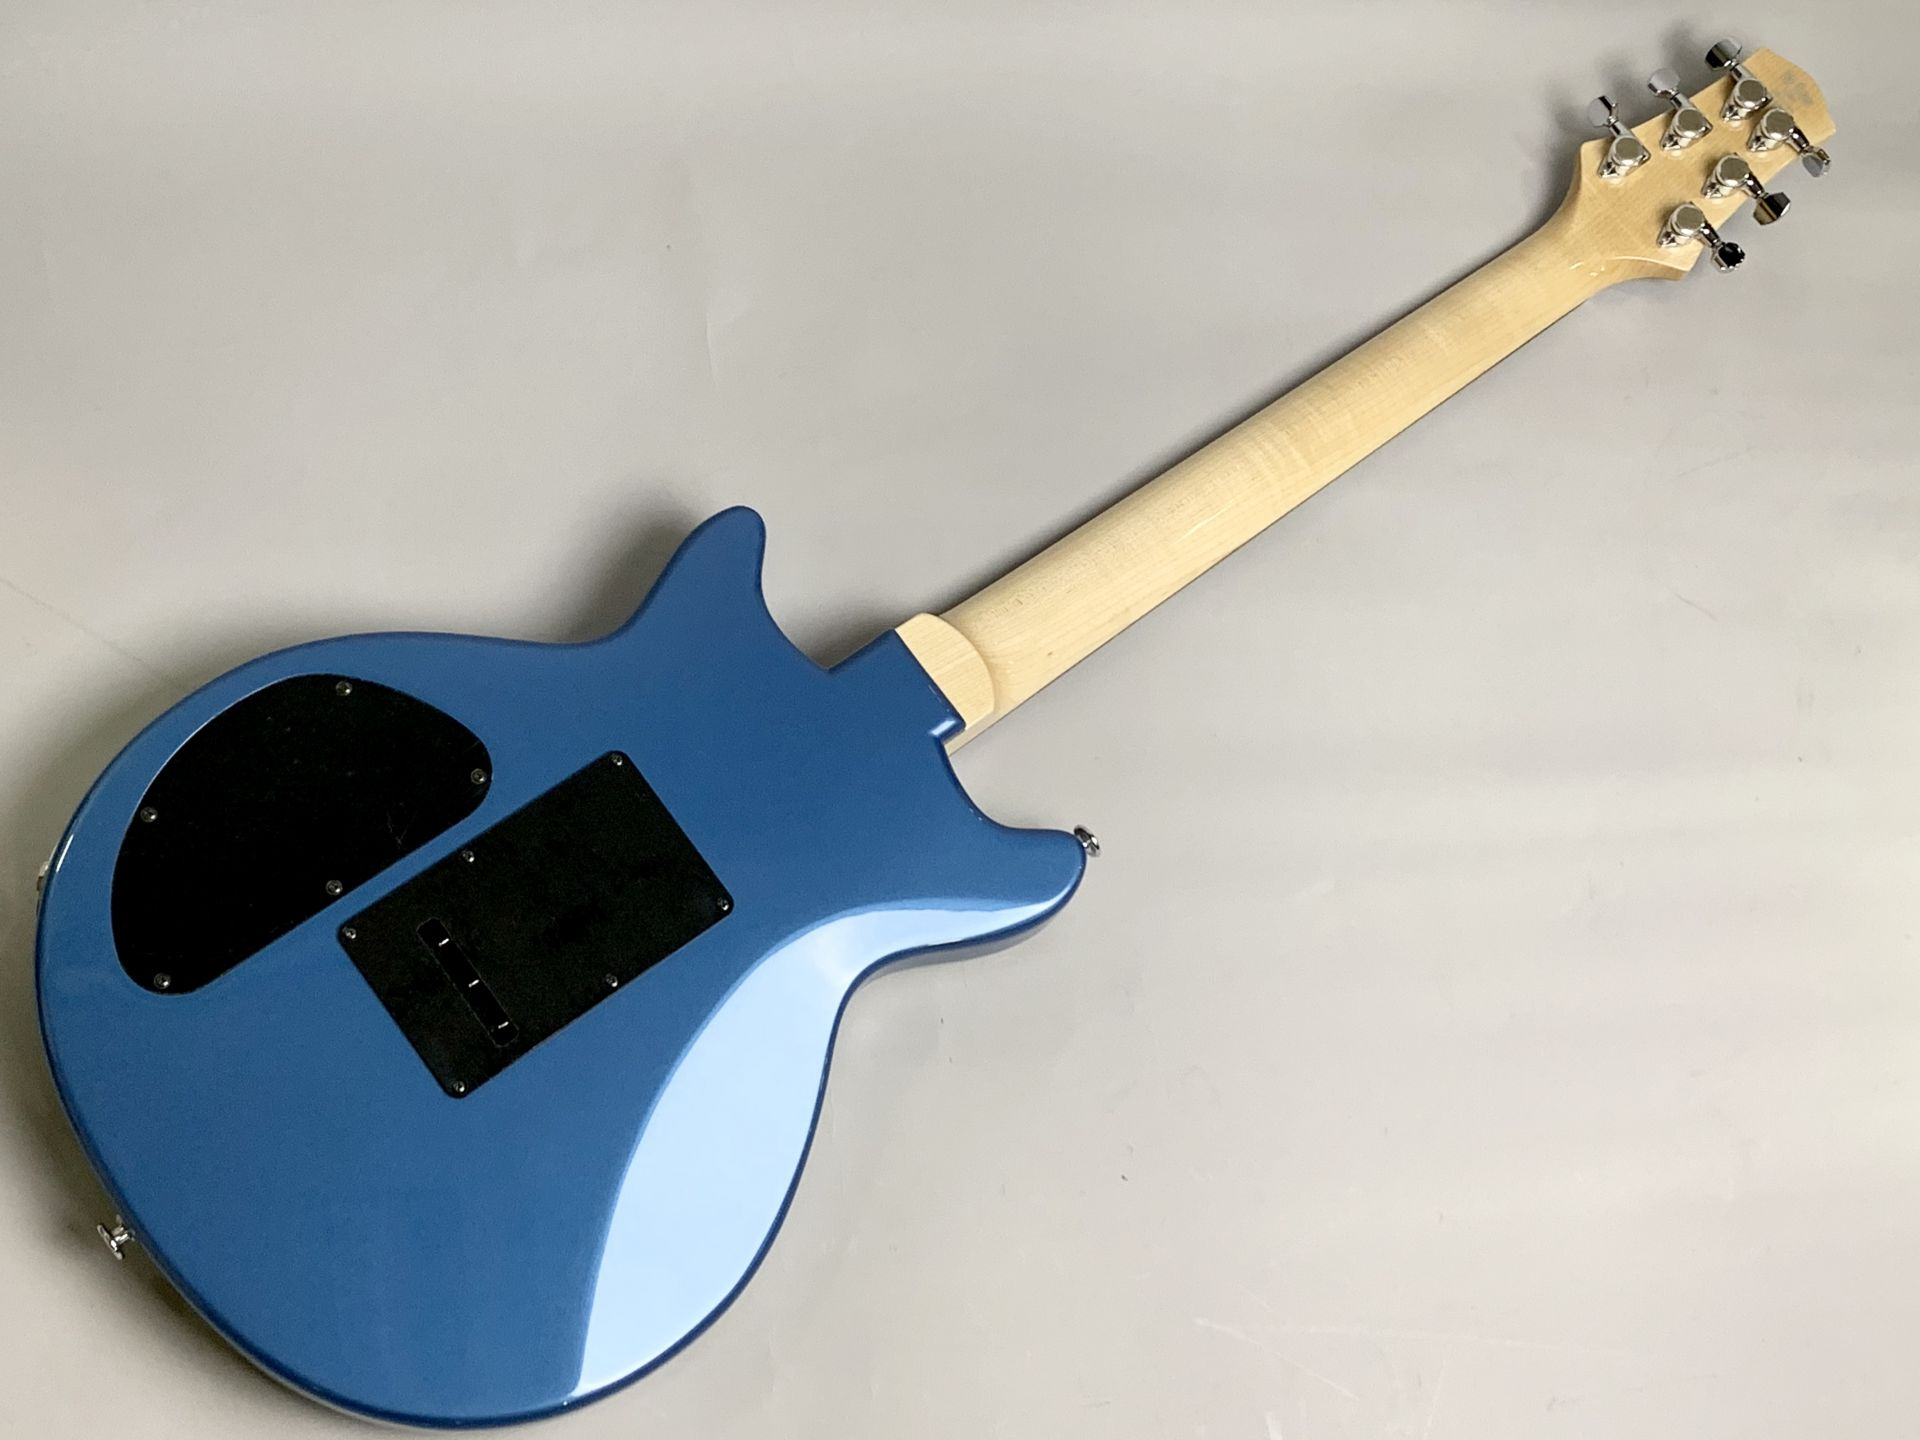 Kz One Junior SSD10 Synchro Lake Placid Blue【新開発ダブルコイル搭載特注モデル】の全体画像(縦)